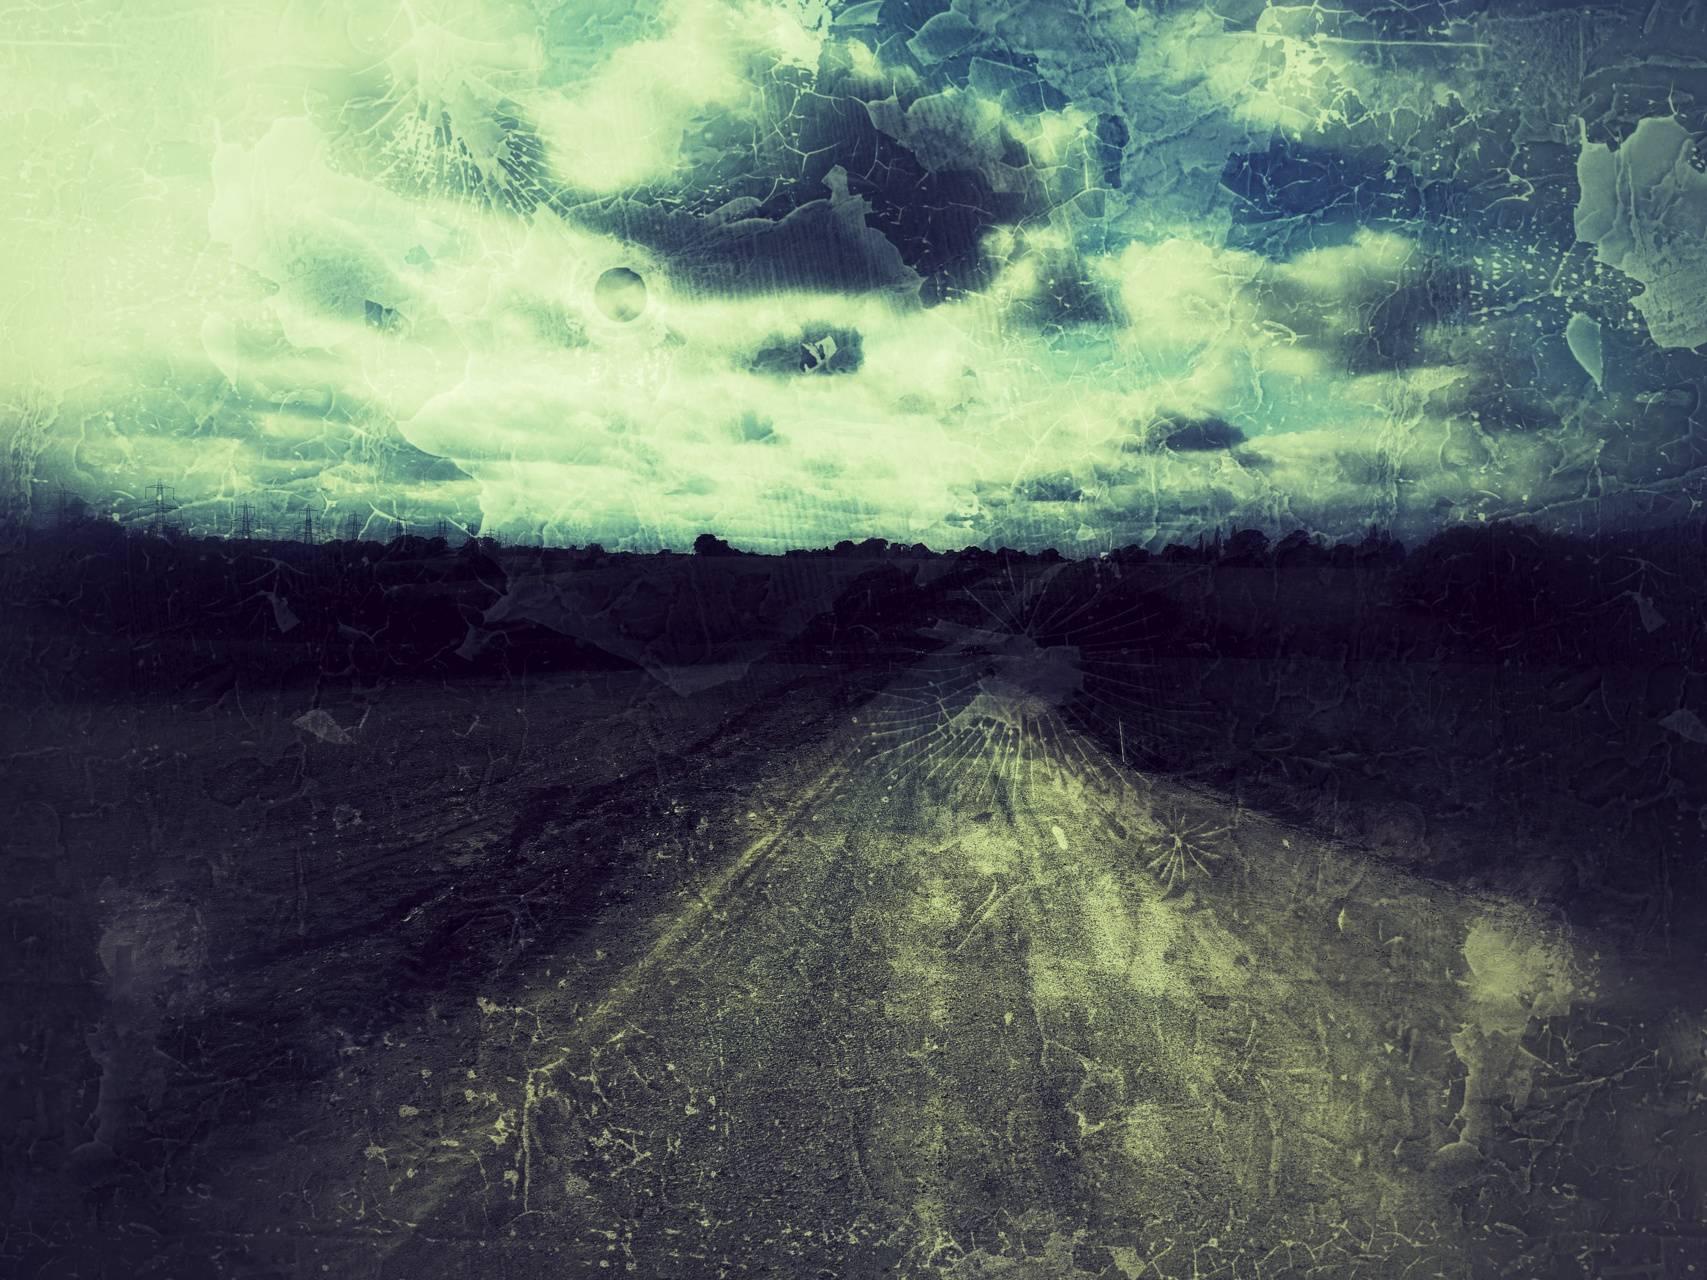 Road of Morpheus